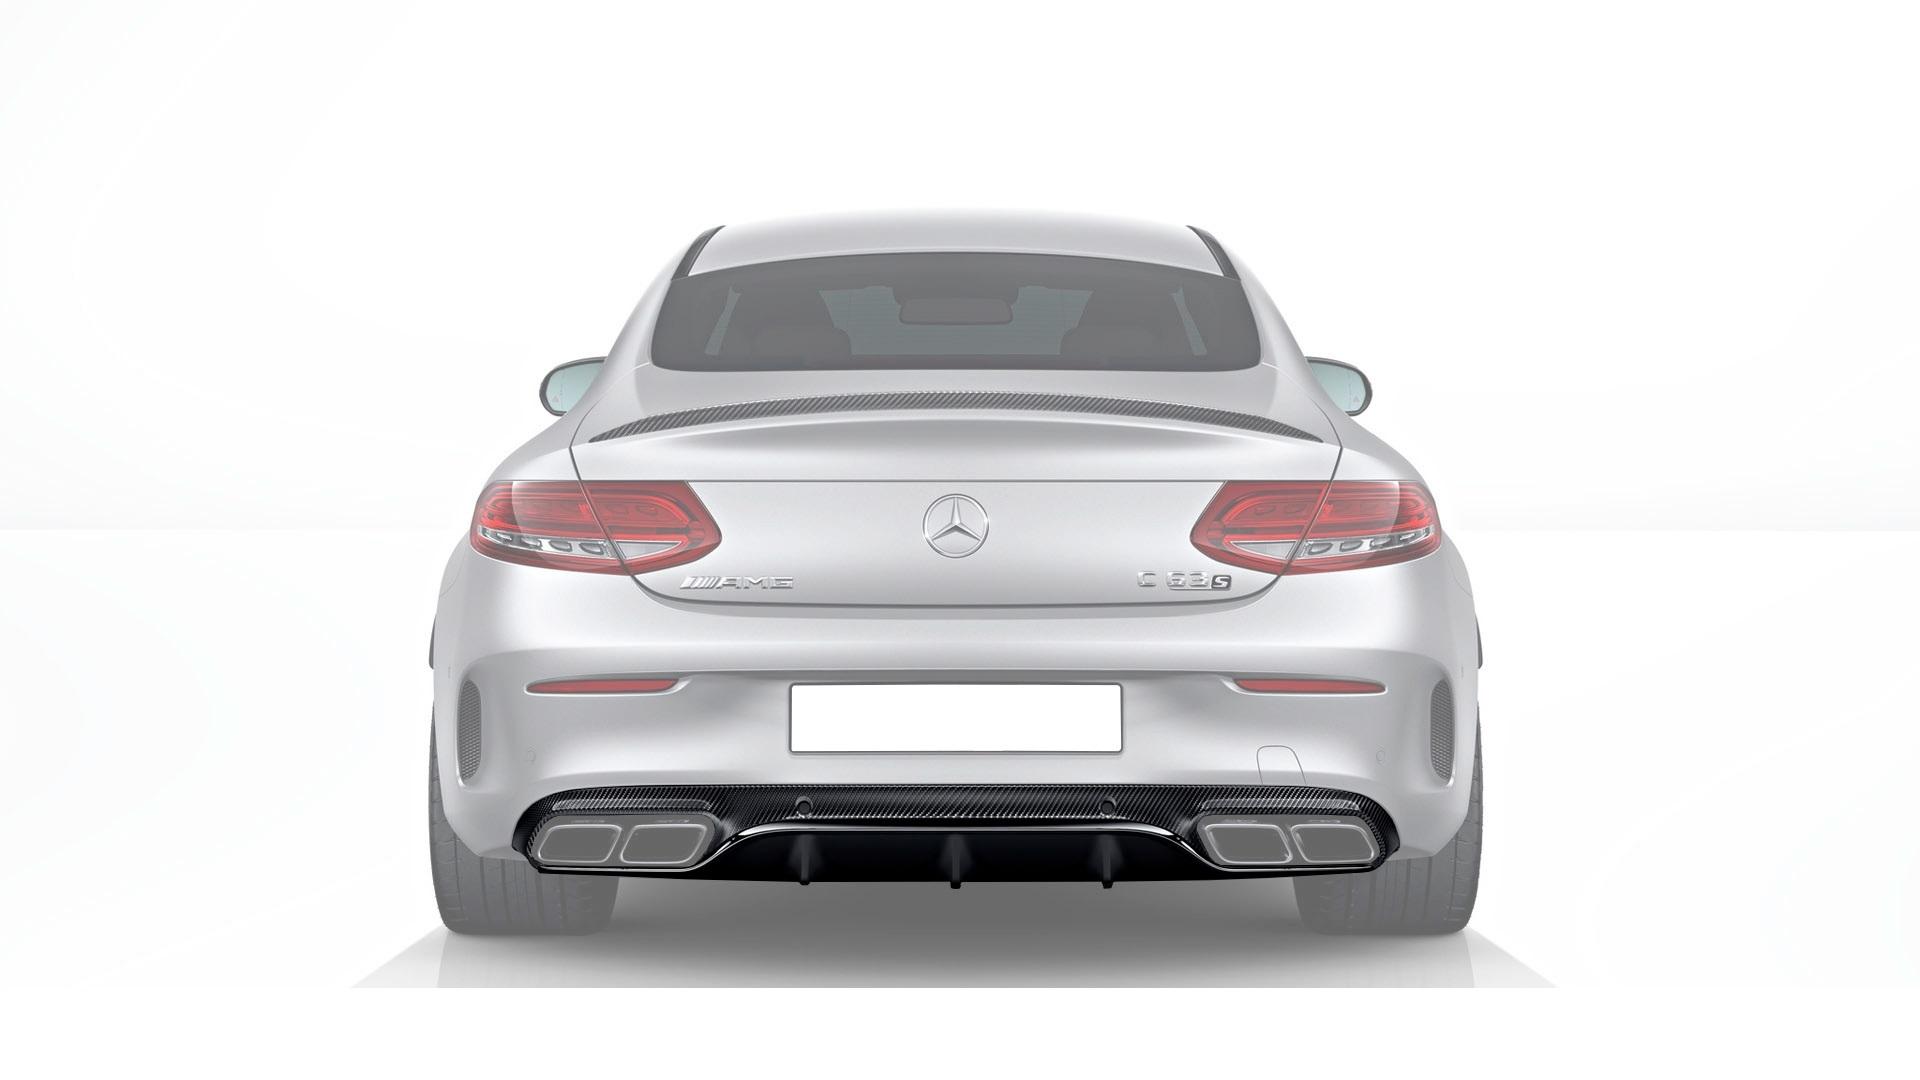 Карбоновый диффузор заднего бампера 63 AMG Style для Mercedes С-class сoupe С205